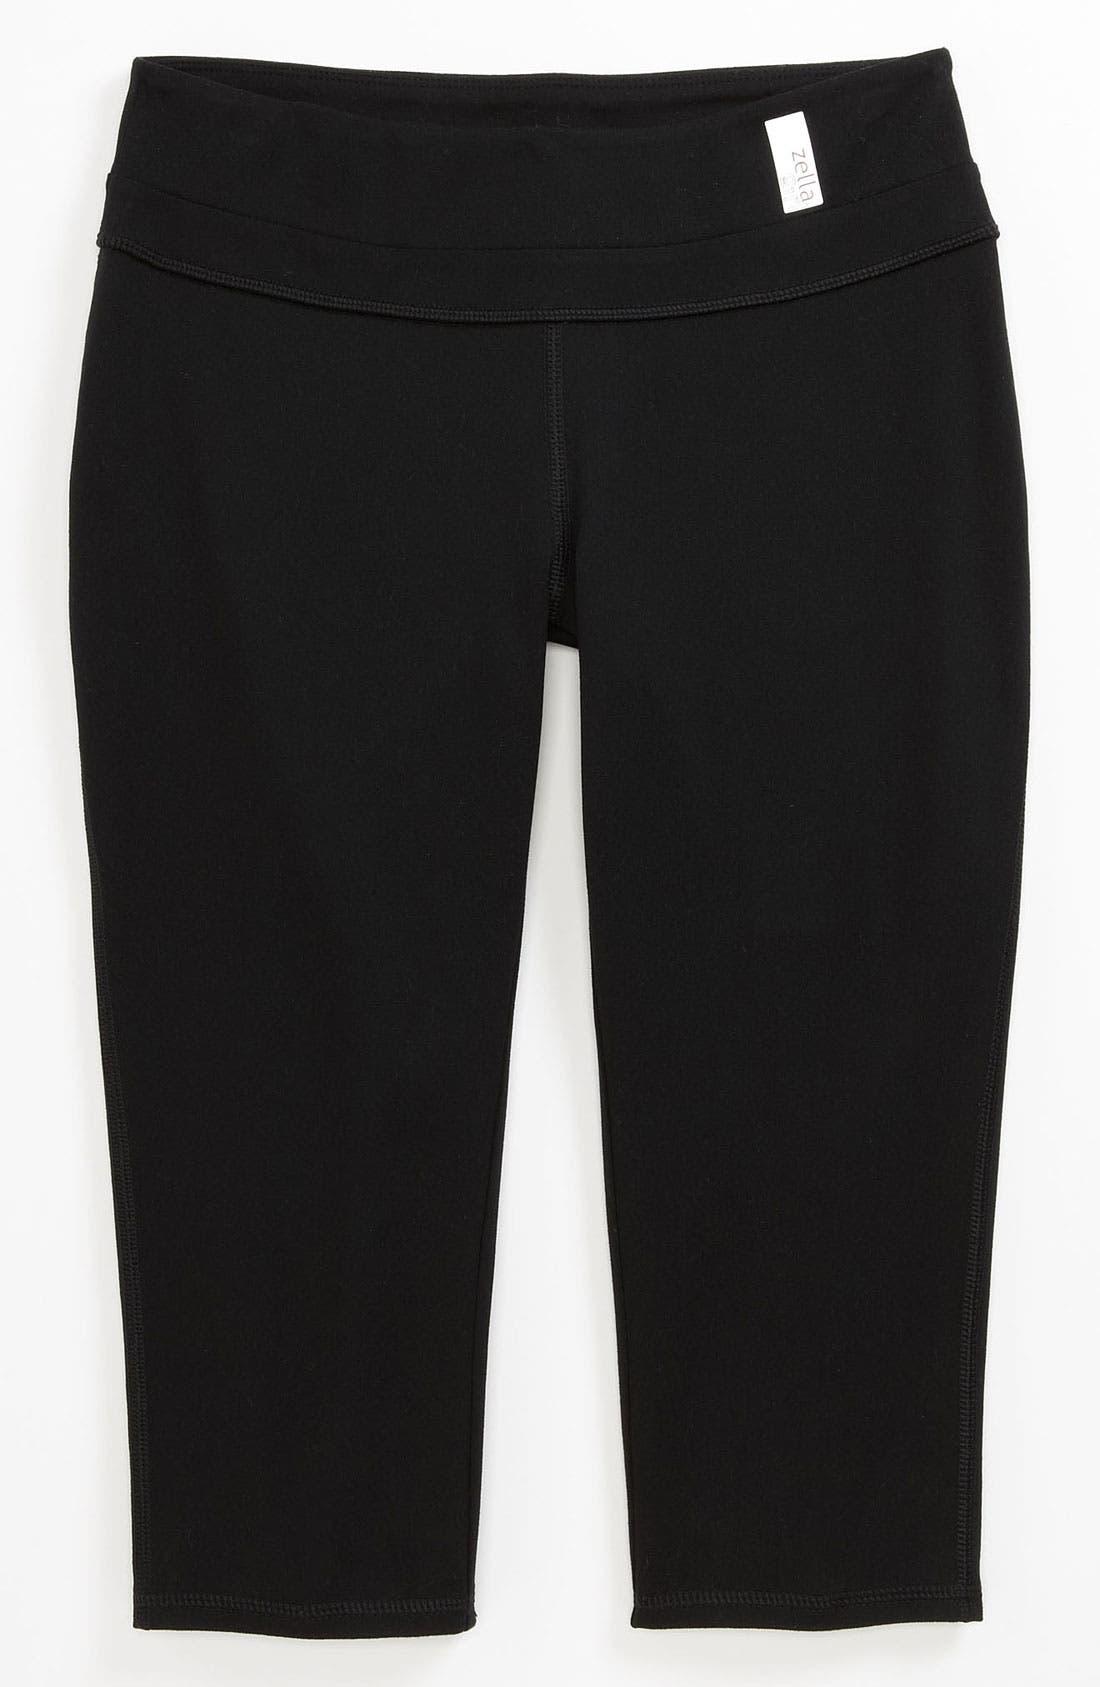 Main Image - Zella Girl 'Trainer' Capri Pants (Little Girls & Big Girls)